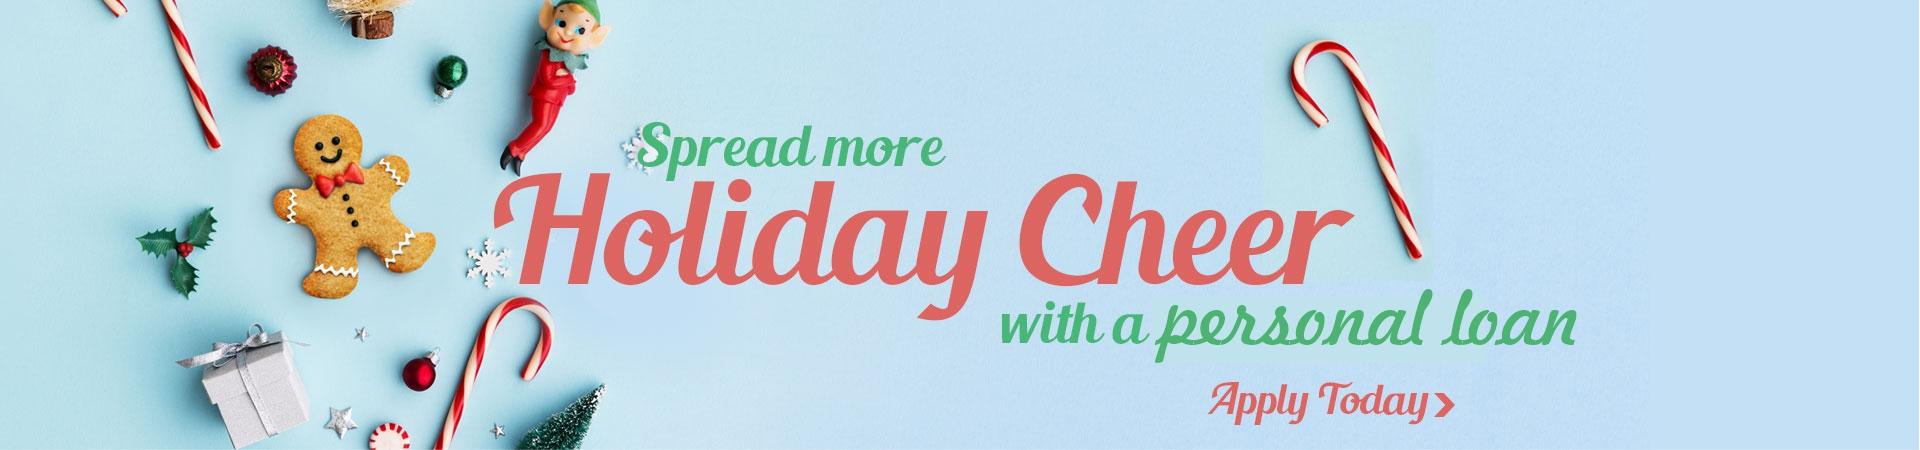 Holiday Cheer Loan